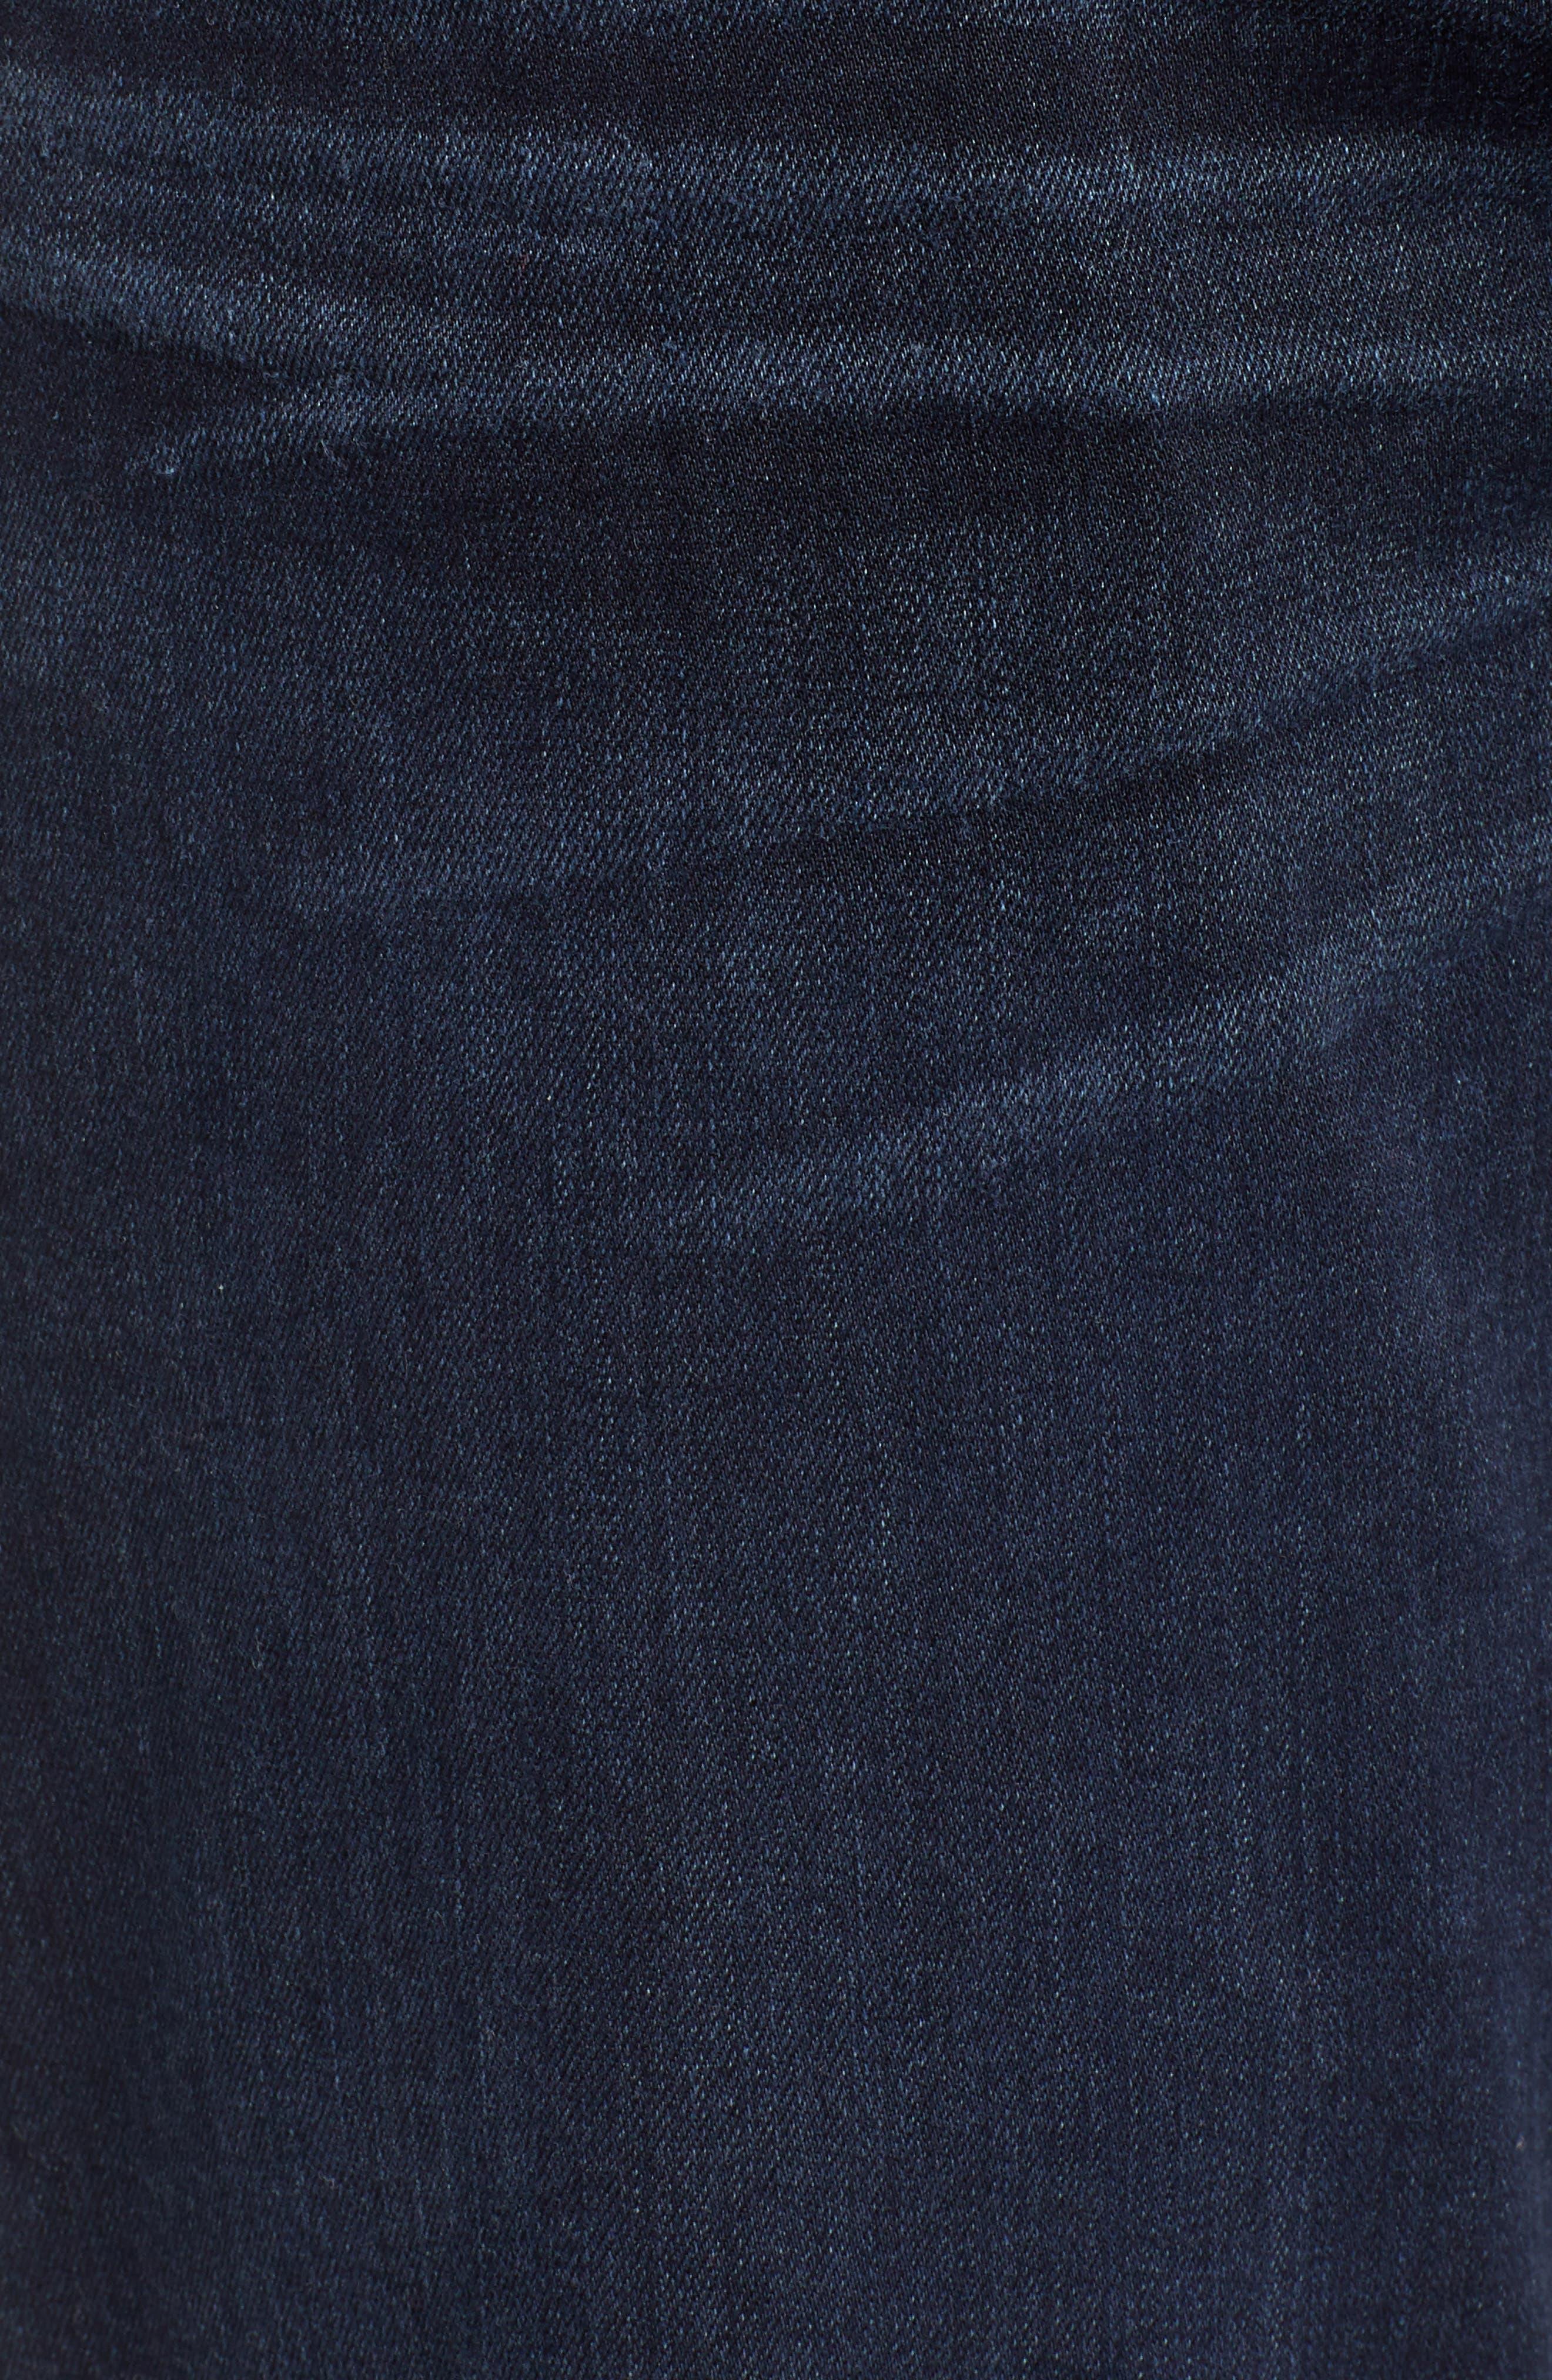 Transcend - Lennox Slim Fit Jeans,                             Alternate thumbnail 5, color,                             400